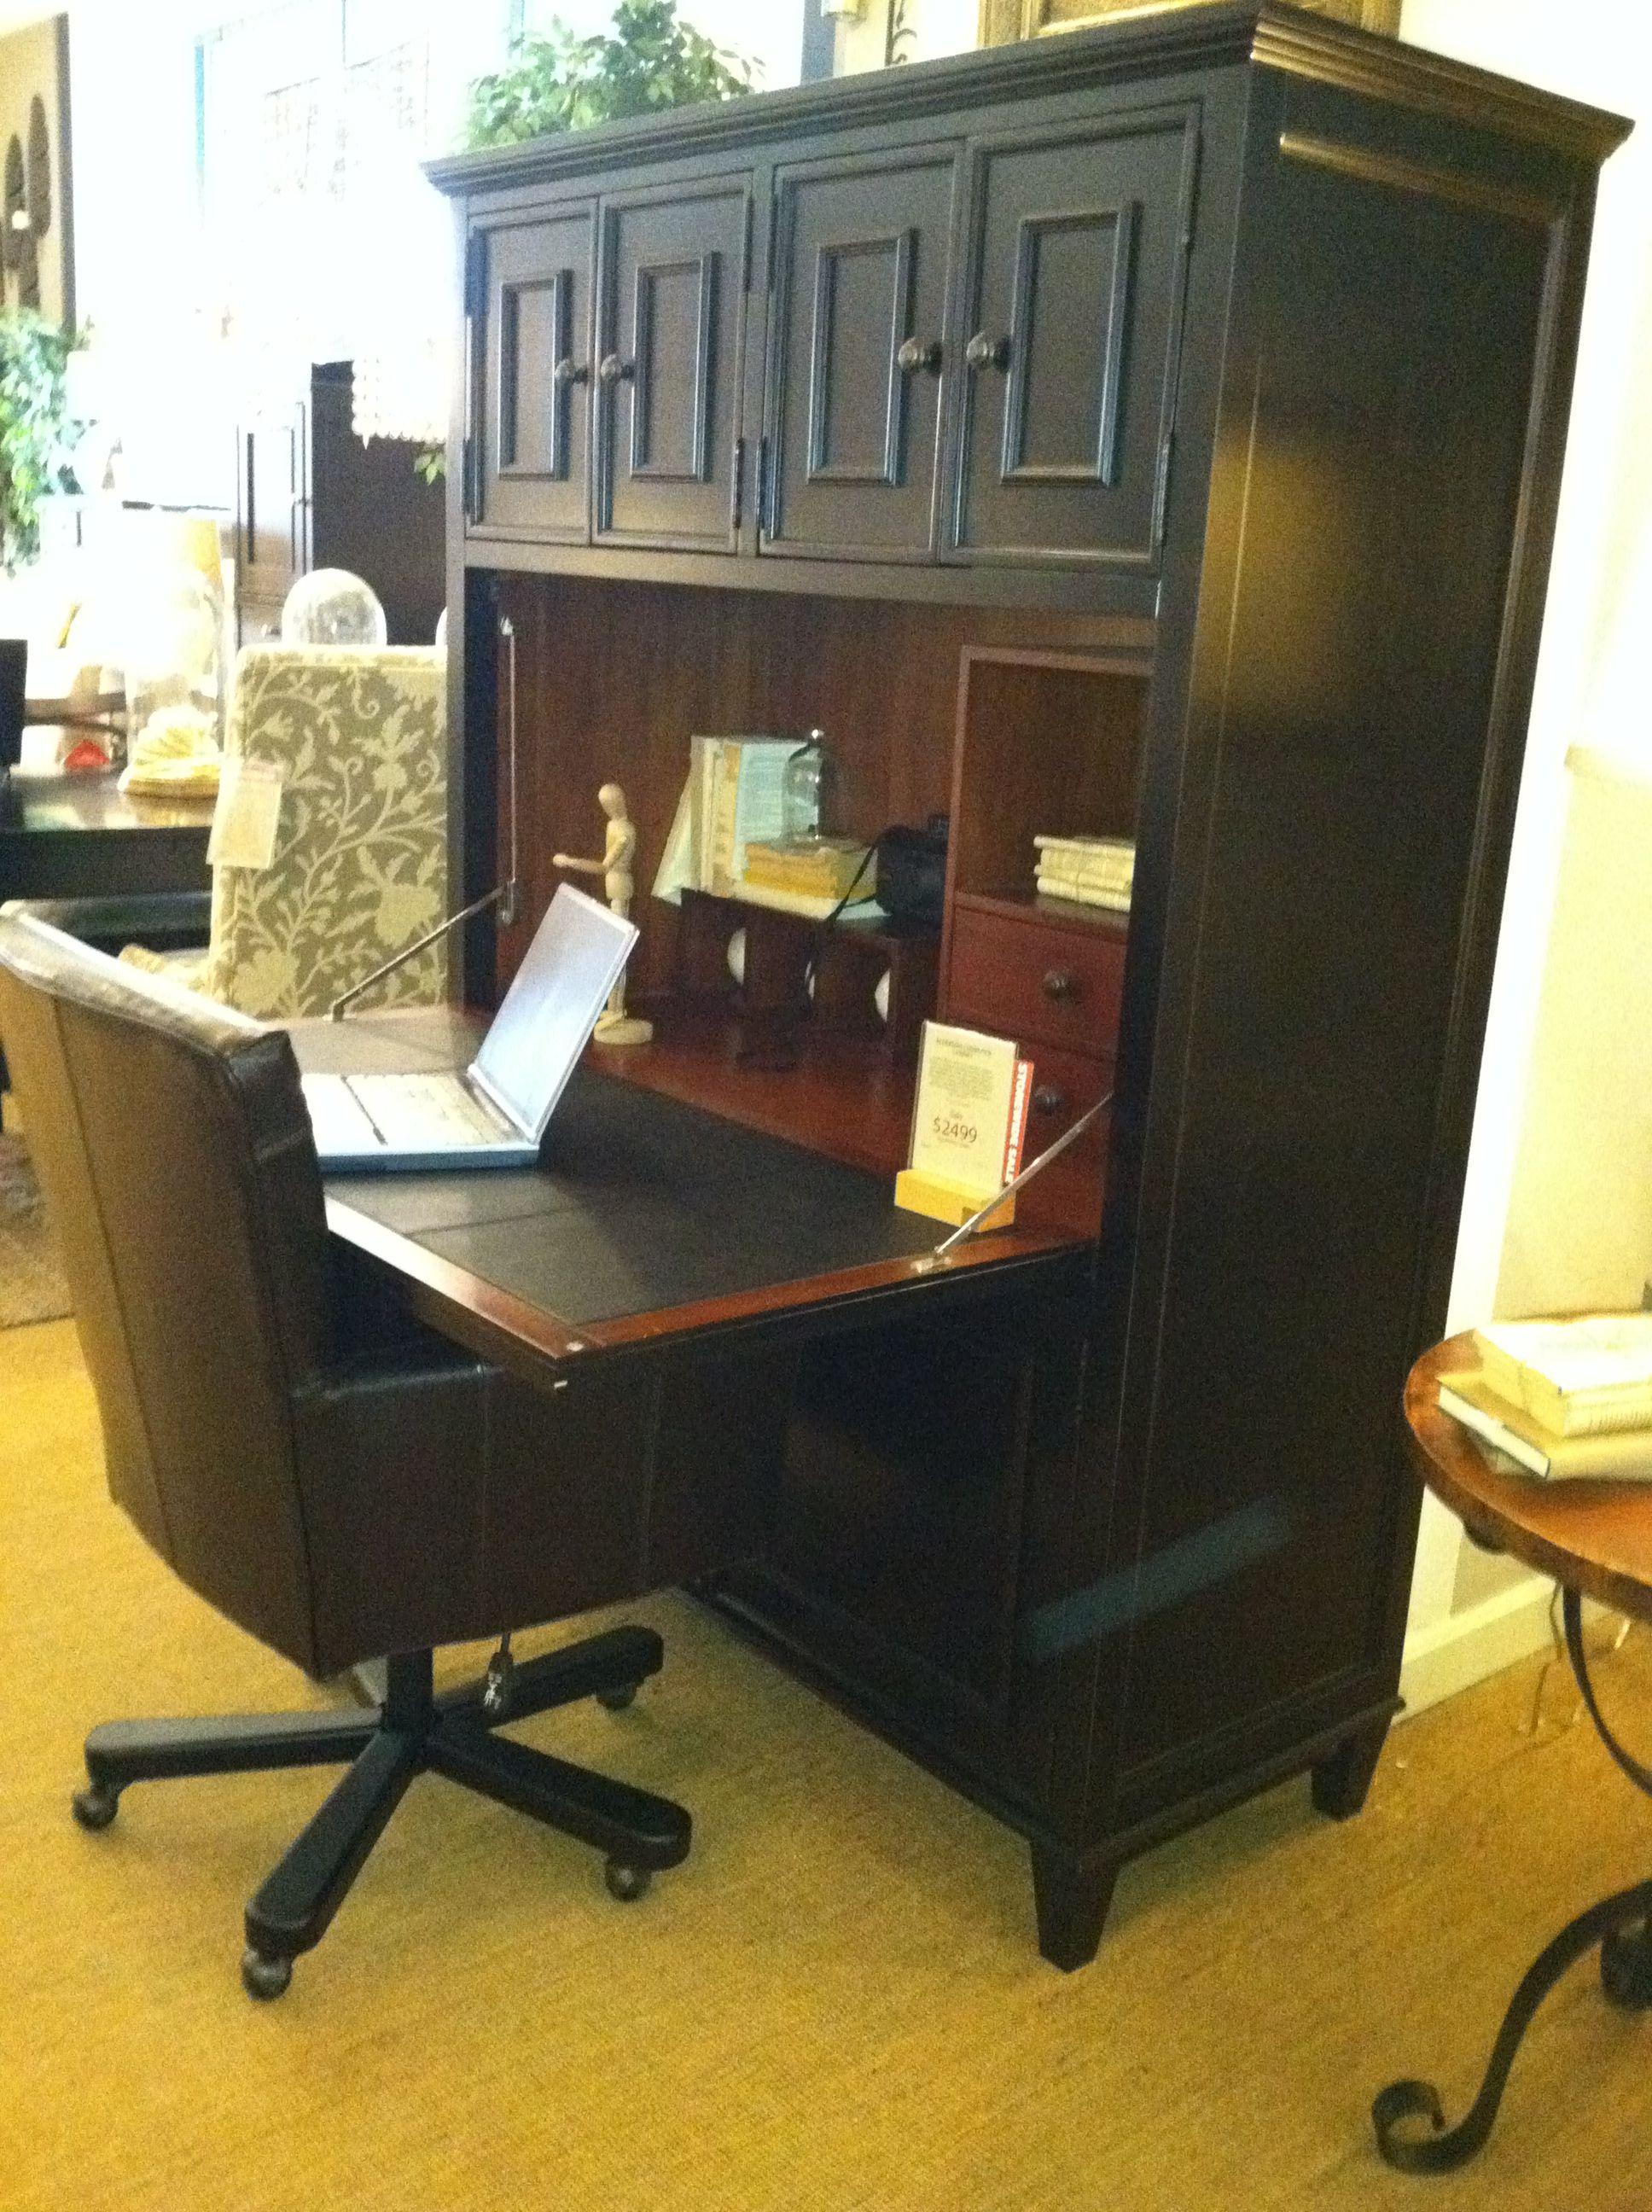 arhaus computer armoire